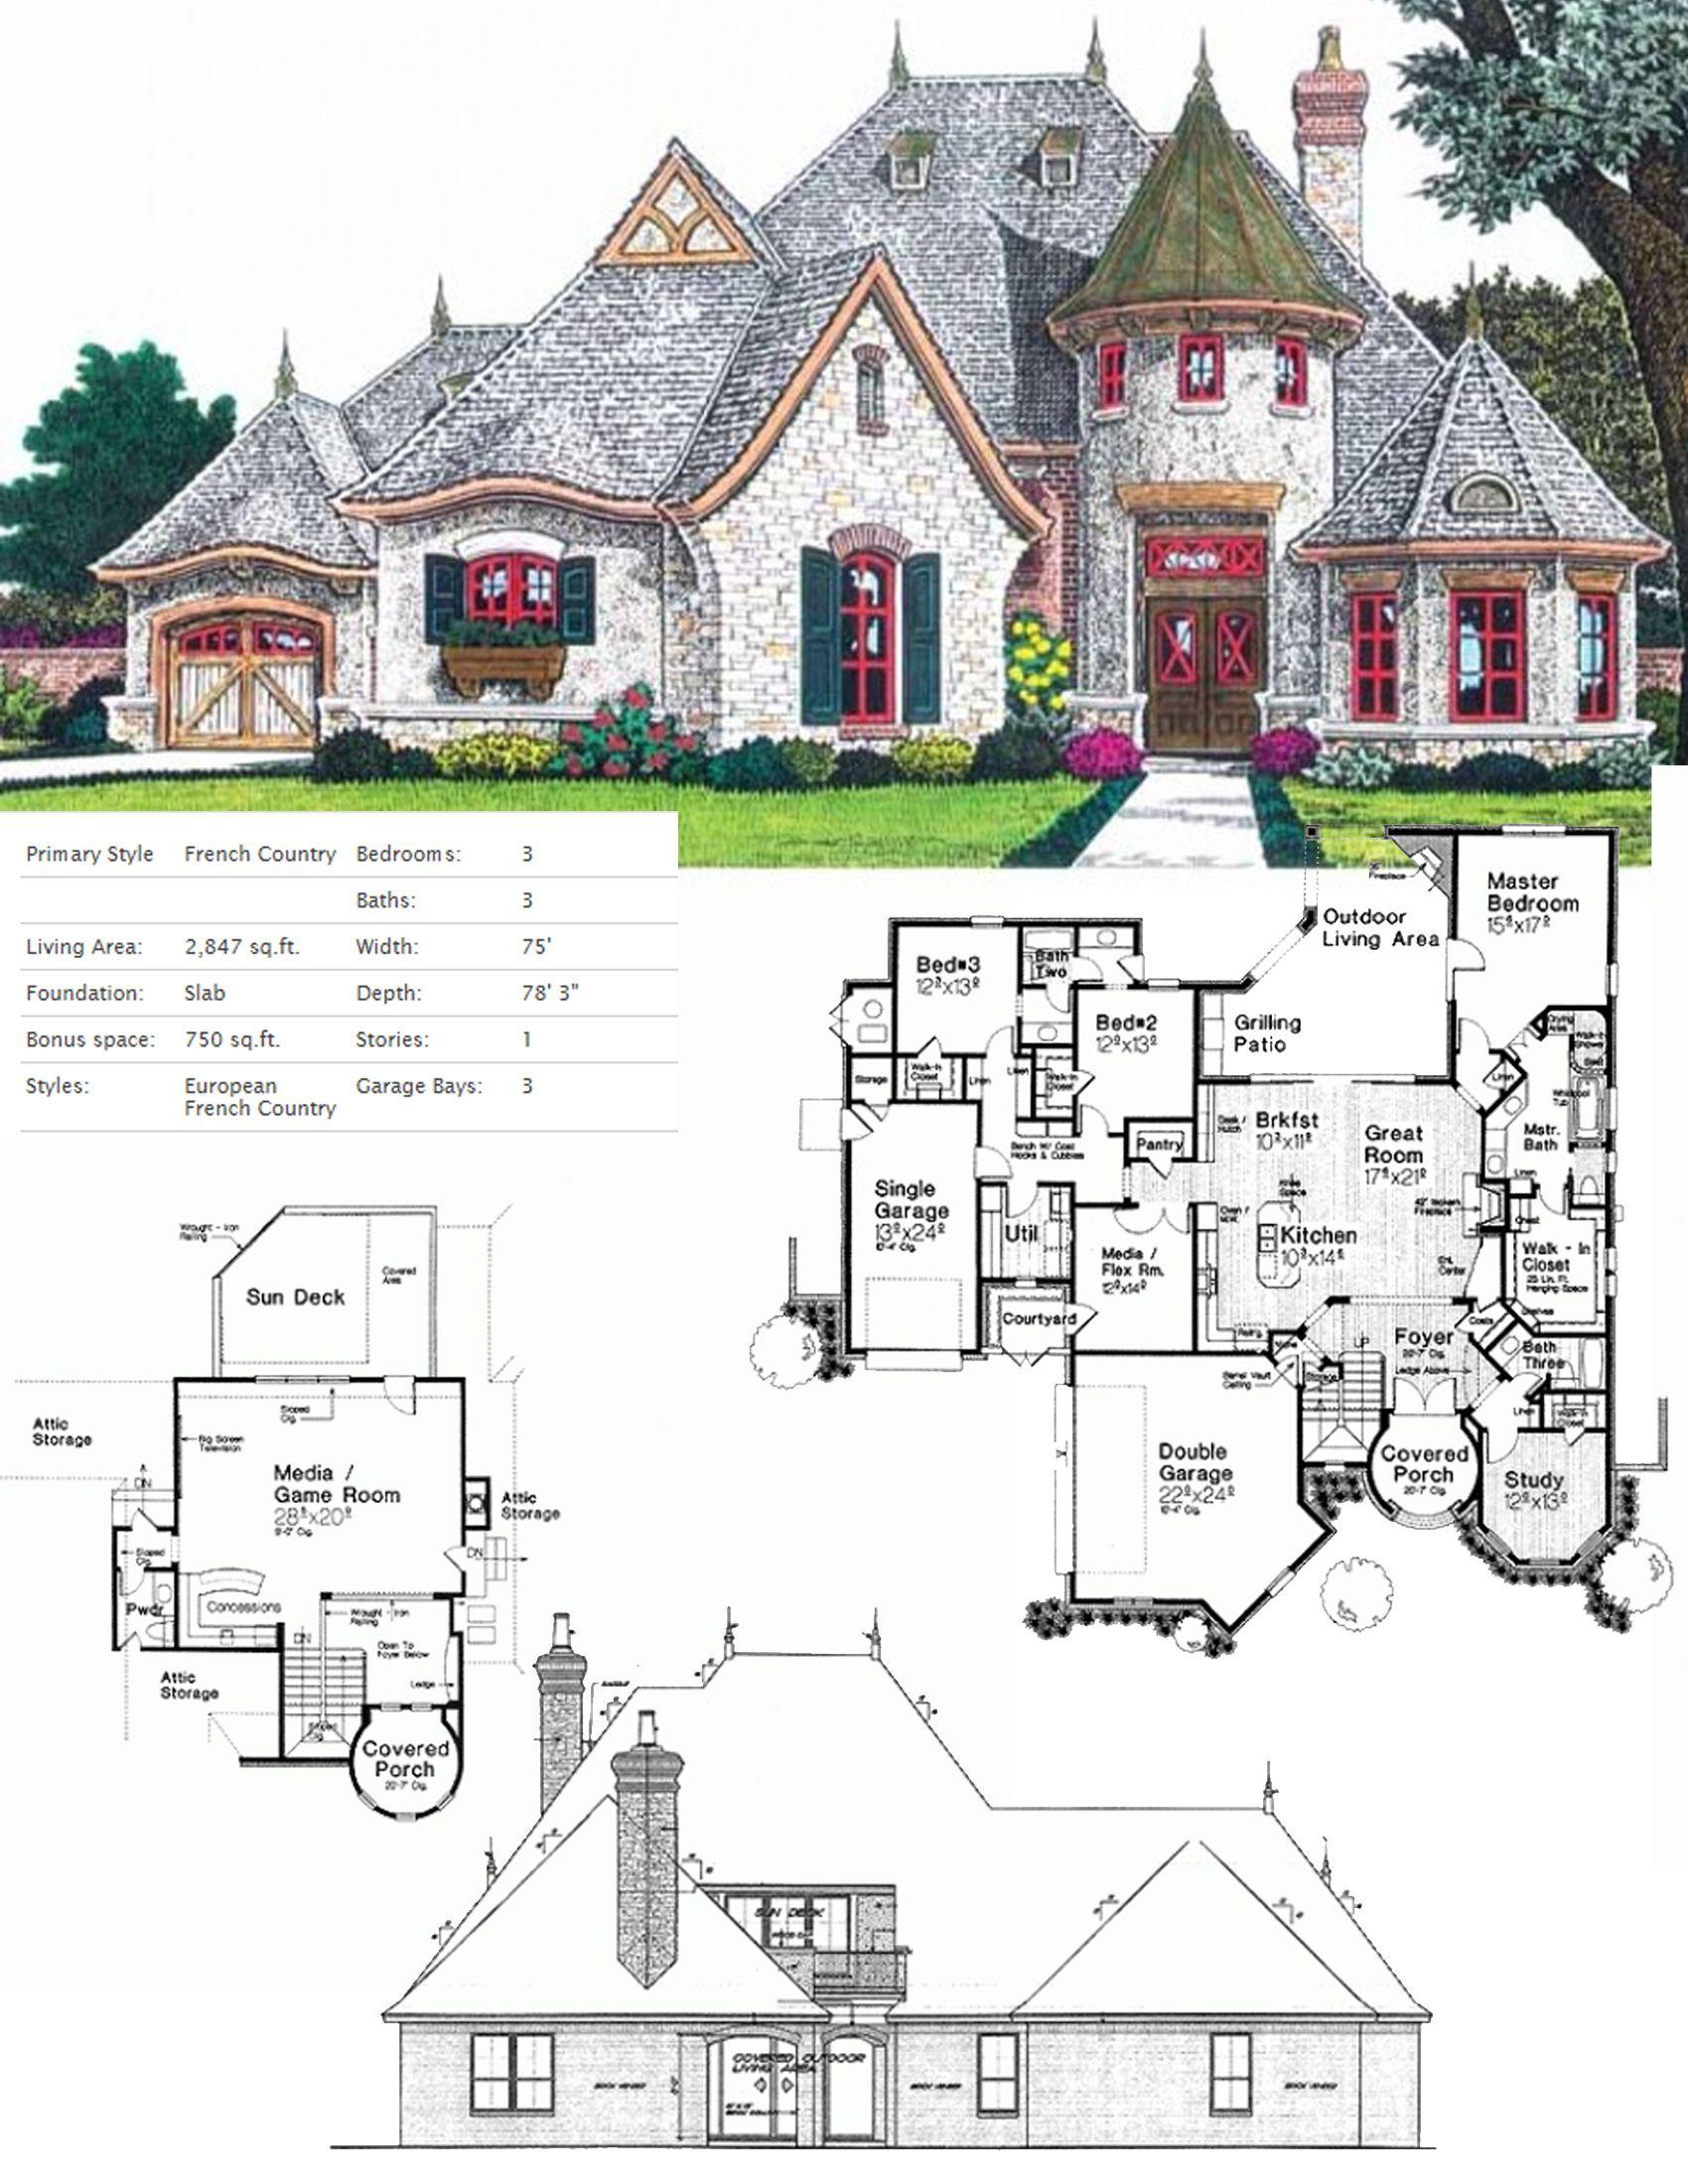 European Style House Plan 3 Beds 3 5 Baths 2847 Sq Ft Plan 310 707 In 2020 Country Cottage House Plans House Plans Cottage House Plans